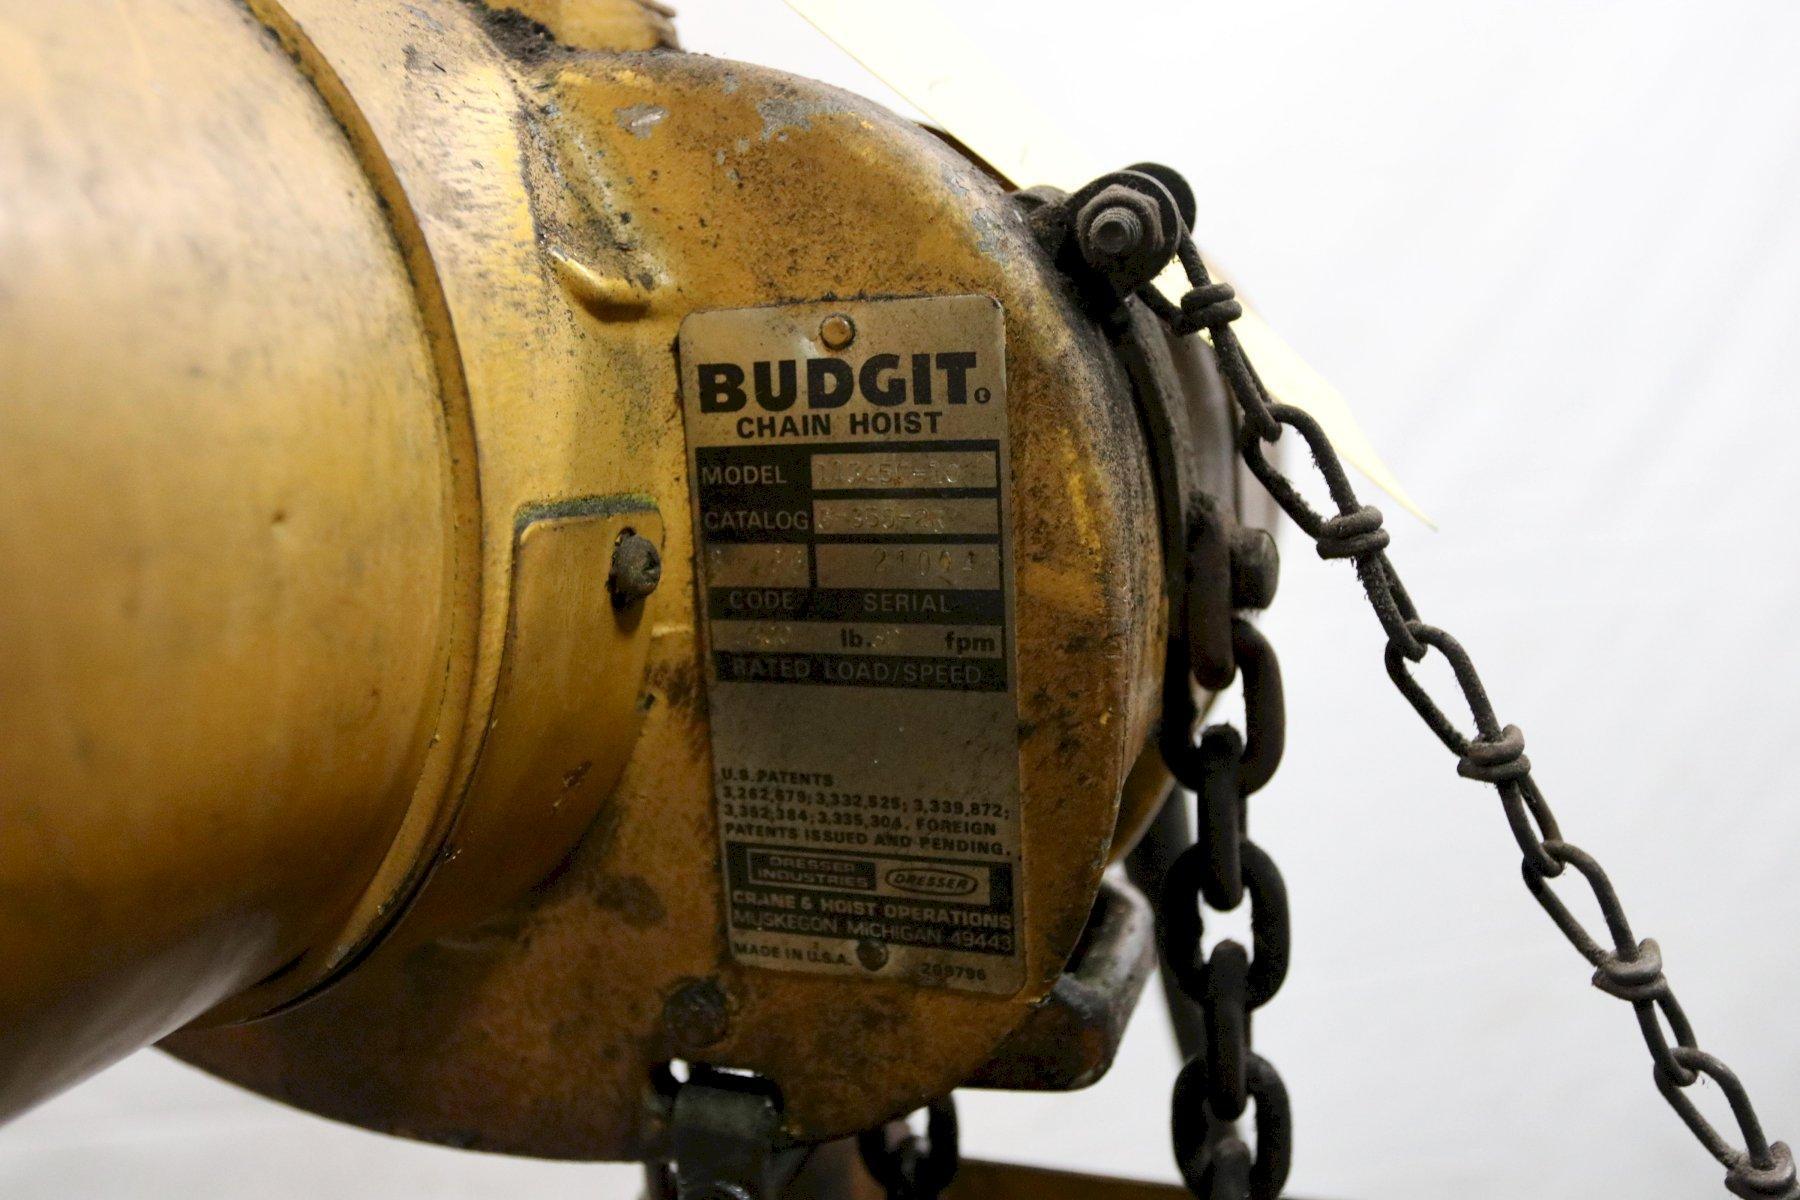 1/4 TON BUDGIT ELECTRIC POWERED CHAIN HOIST: STOCK #11980